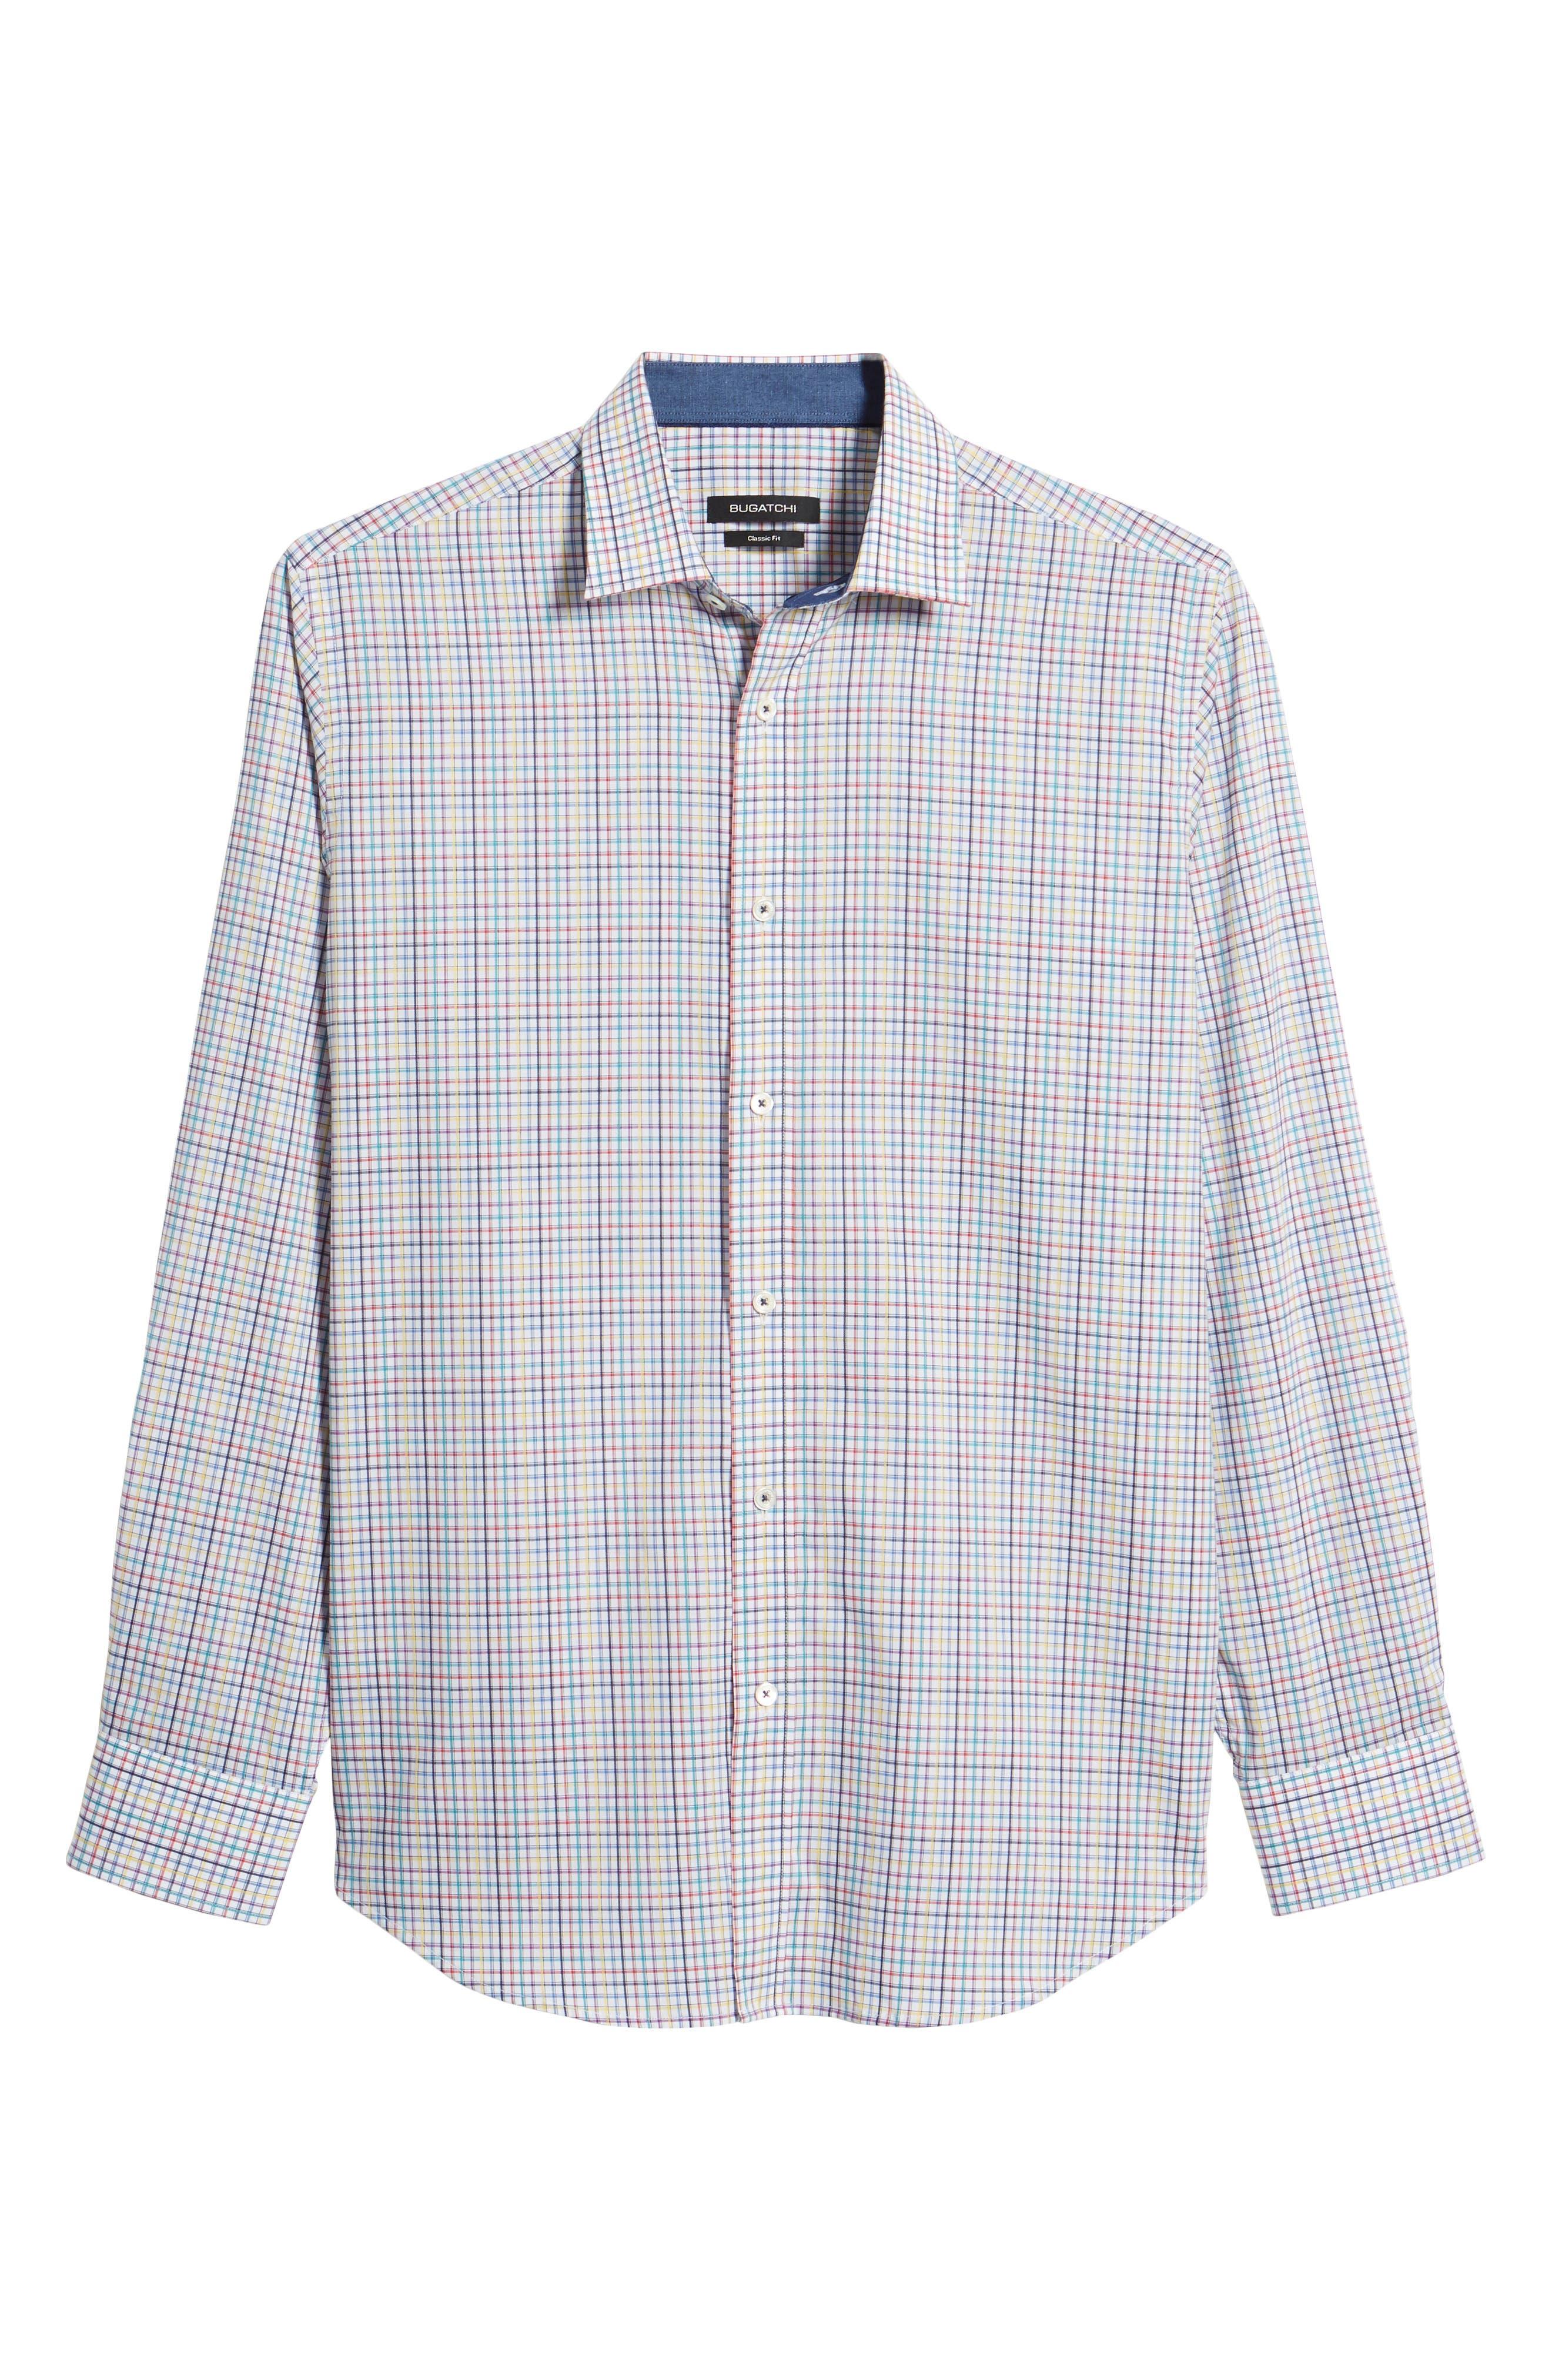 Classic Fit Woven Sport Shirt,                             Alternate thumbnail 6, color,                             601